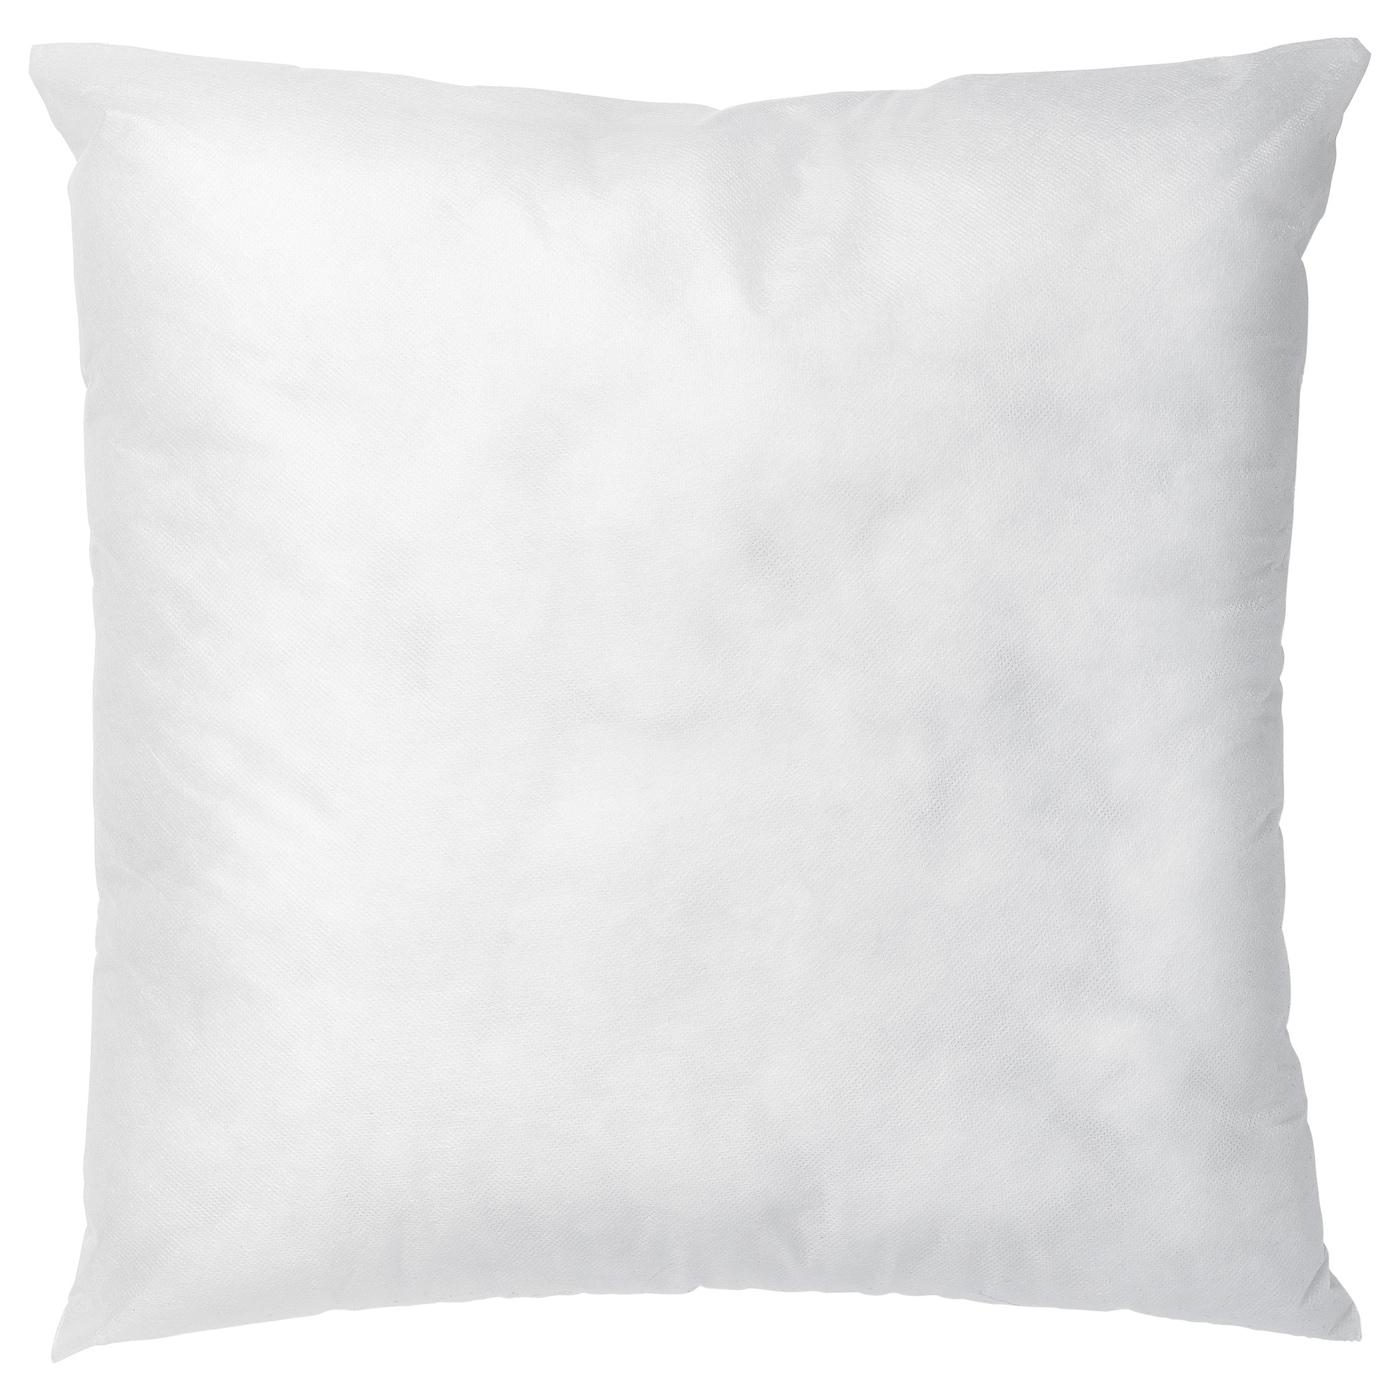 INNER Coussin à recouvrir - blanc - IKEA